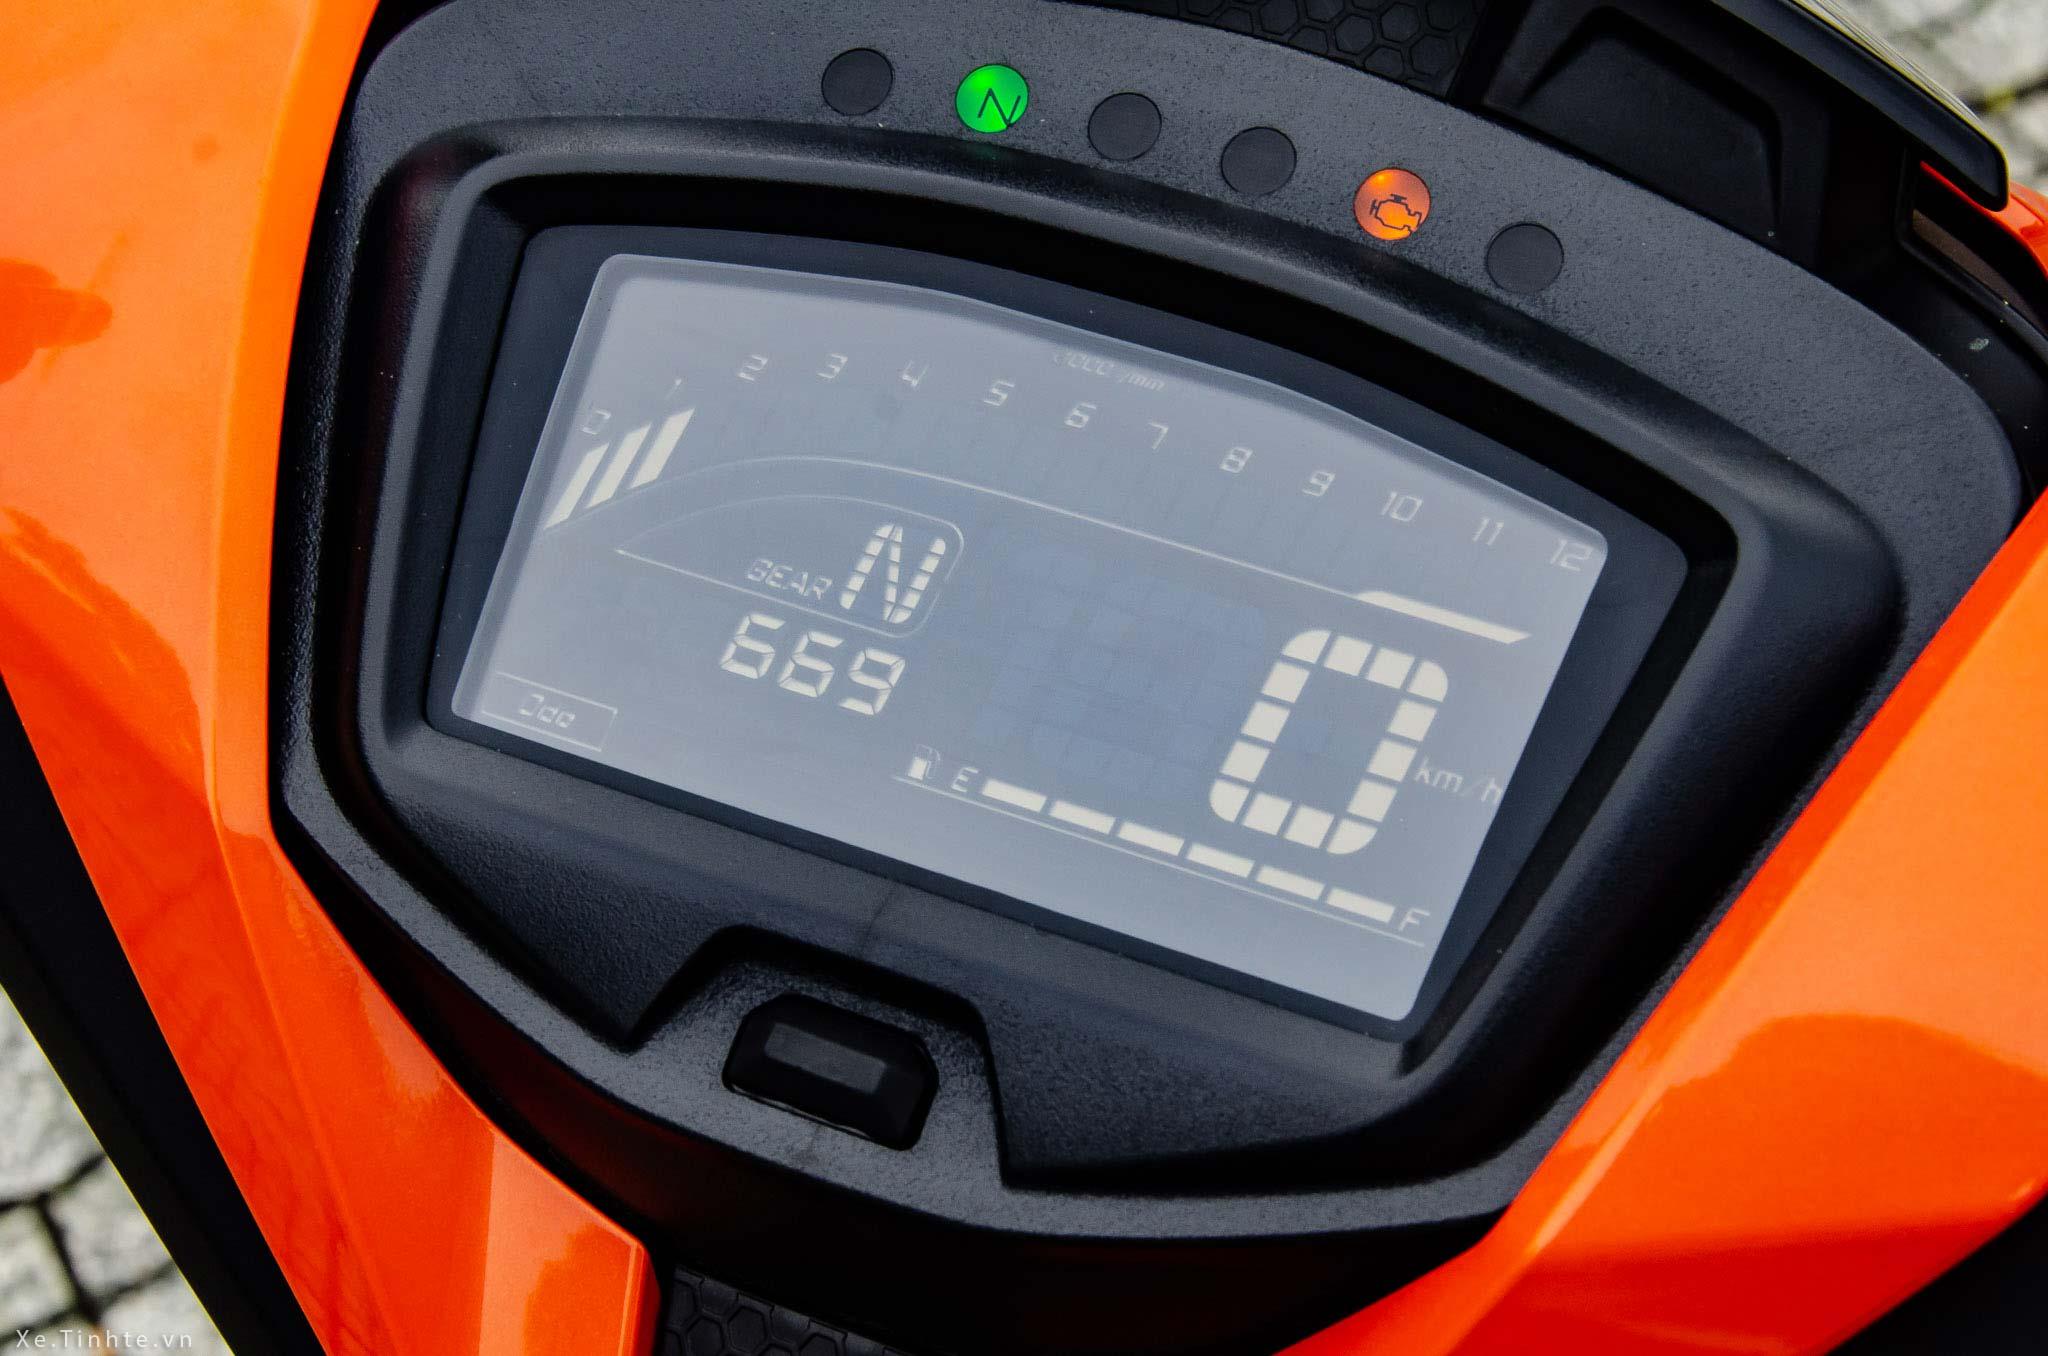 Yamaha-Exciter-150-2018-Xe-Tinhte (38).jpg